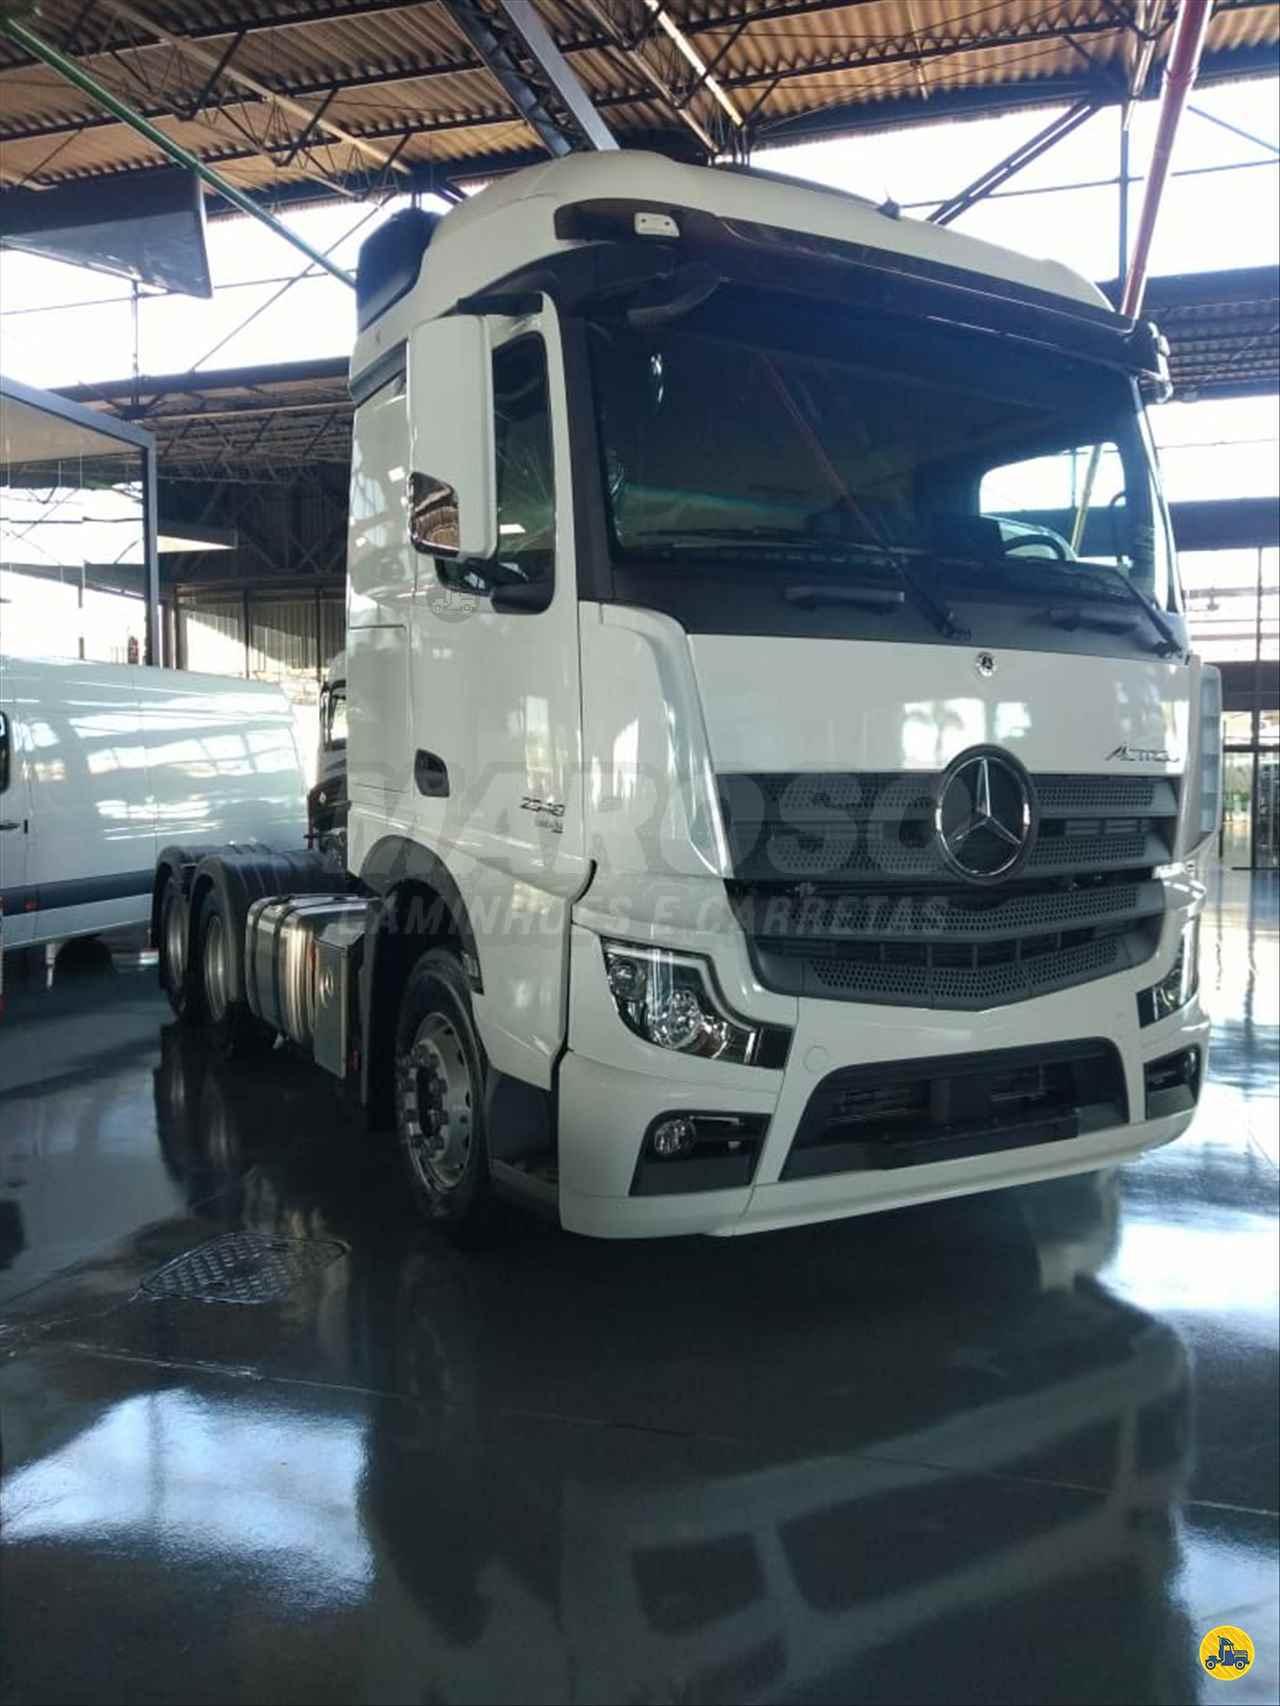 MB 2548 de Maroso Caminhões - PALOTINA/PR